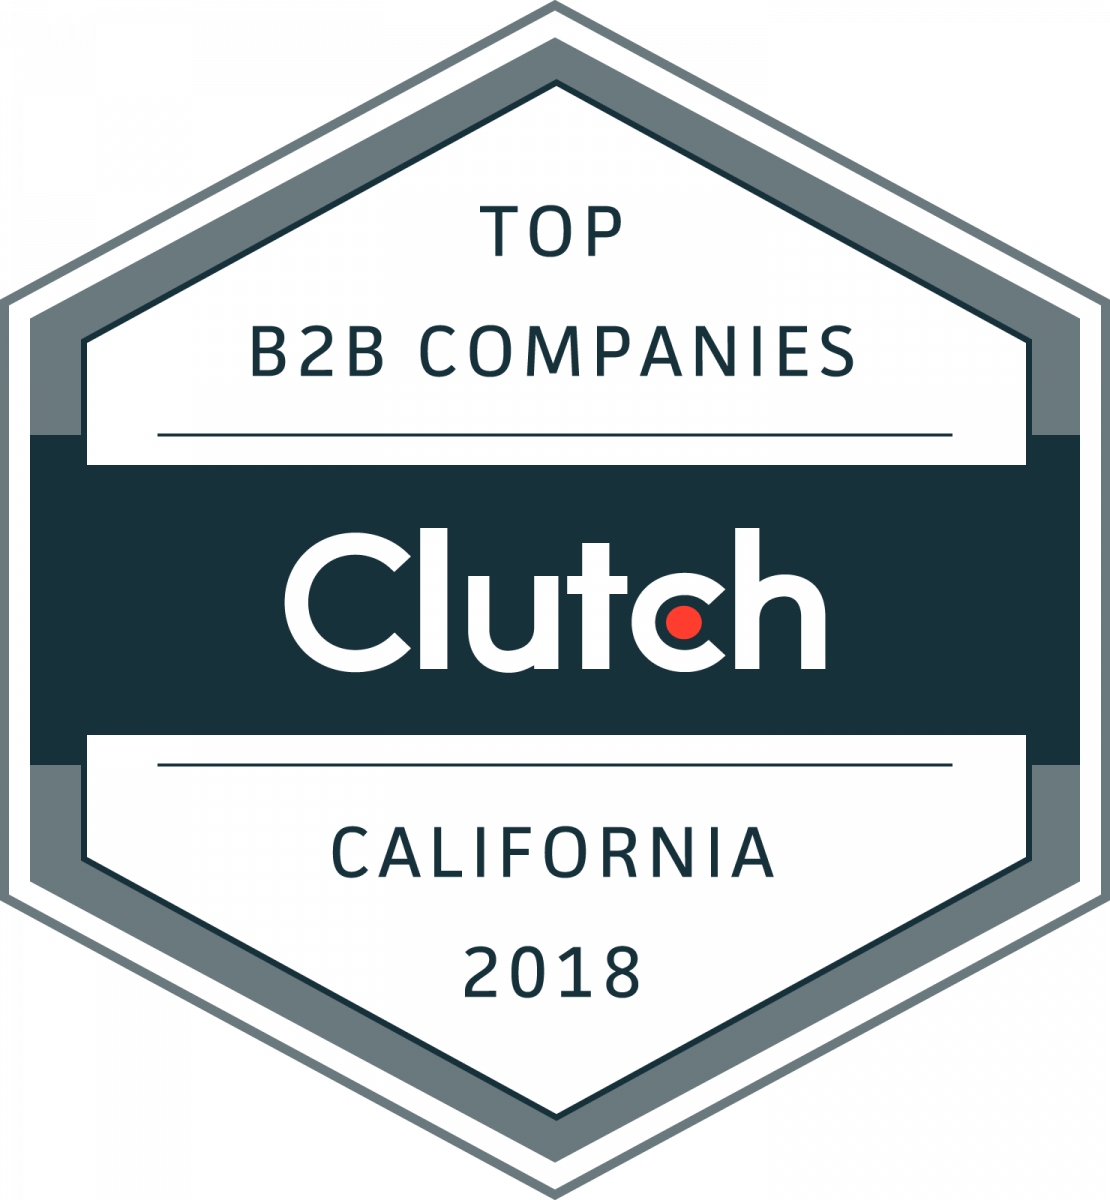 clutch top b2b companies california 2018 award